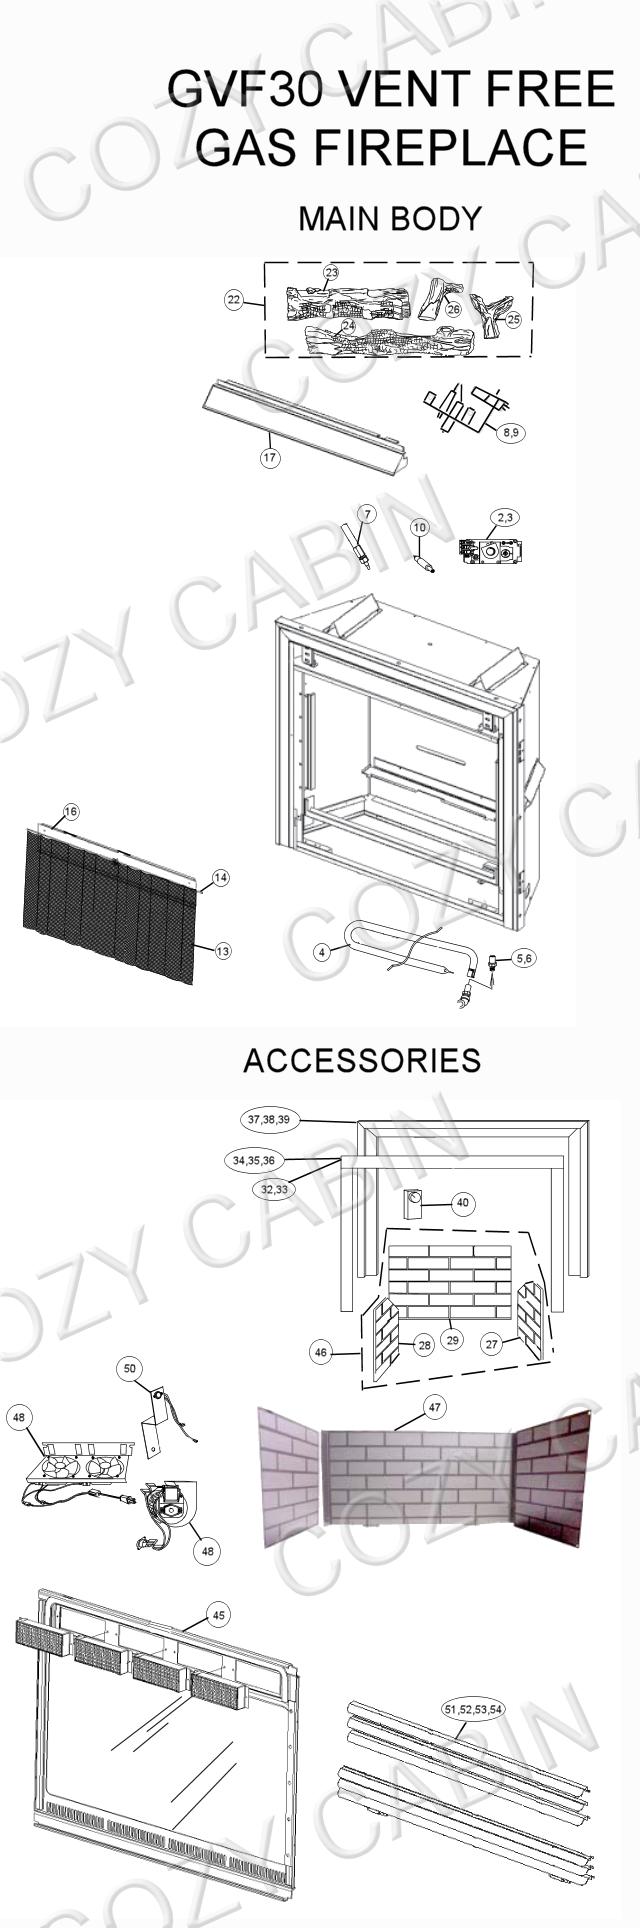 vent free gas fireplace gvf30 gvf30 napoleon parts